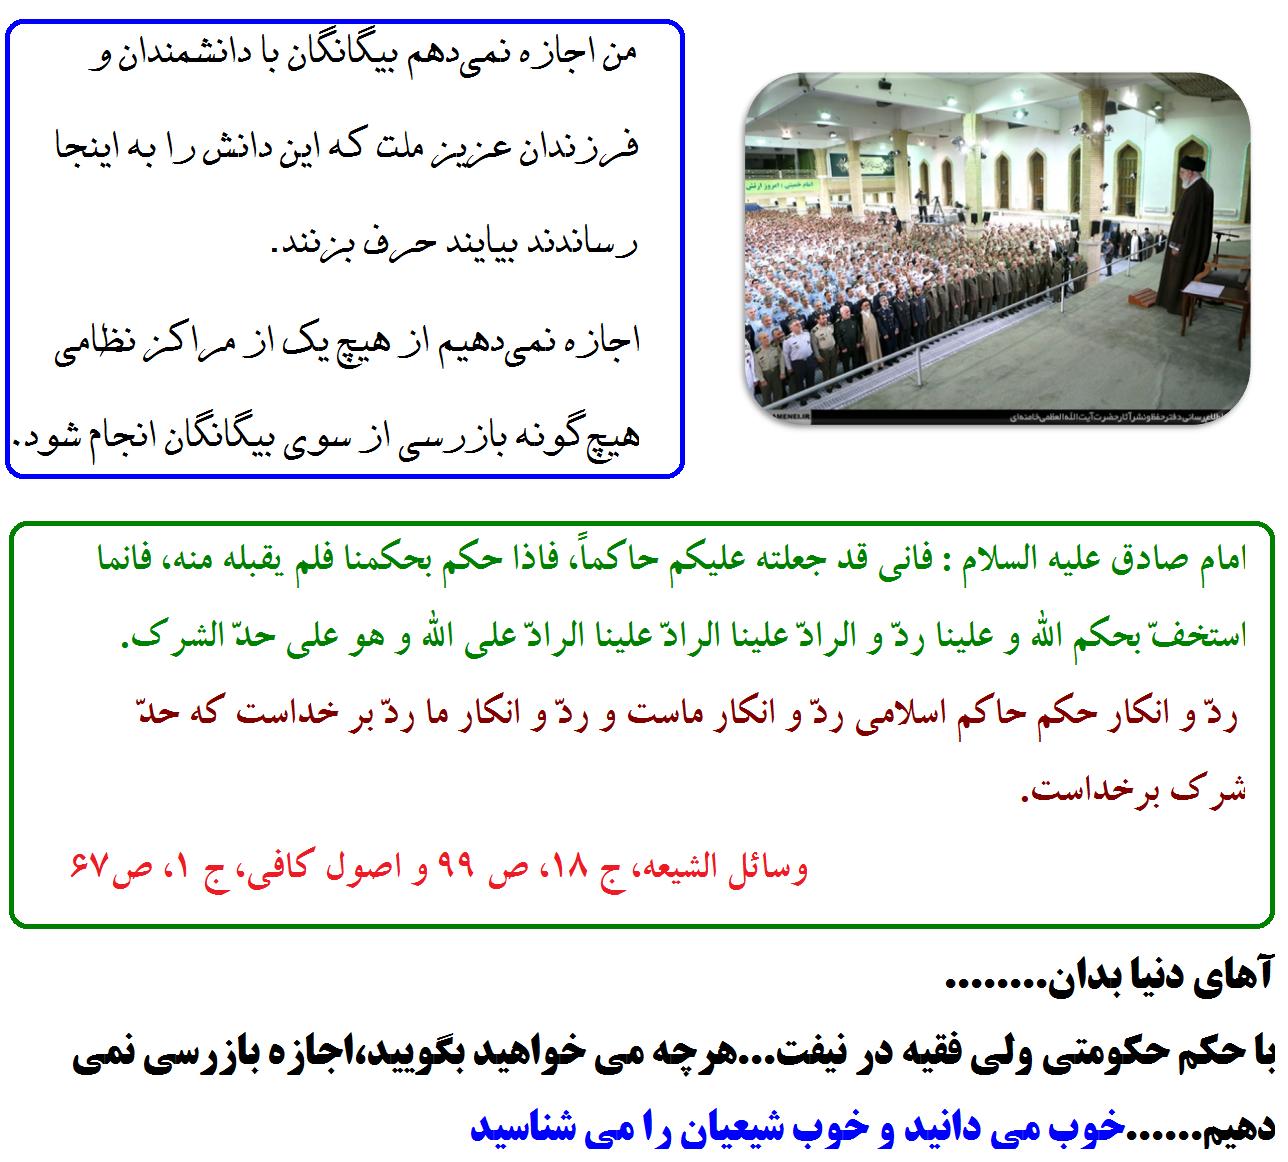 http://rozup.ir/view/222215/Ejazeh%20Nemidahim.png